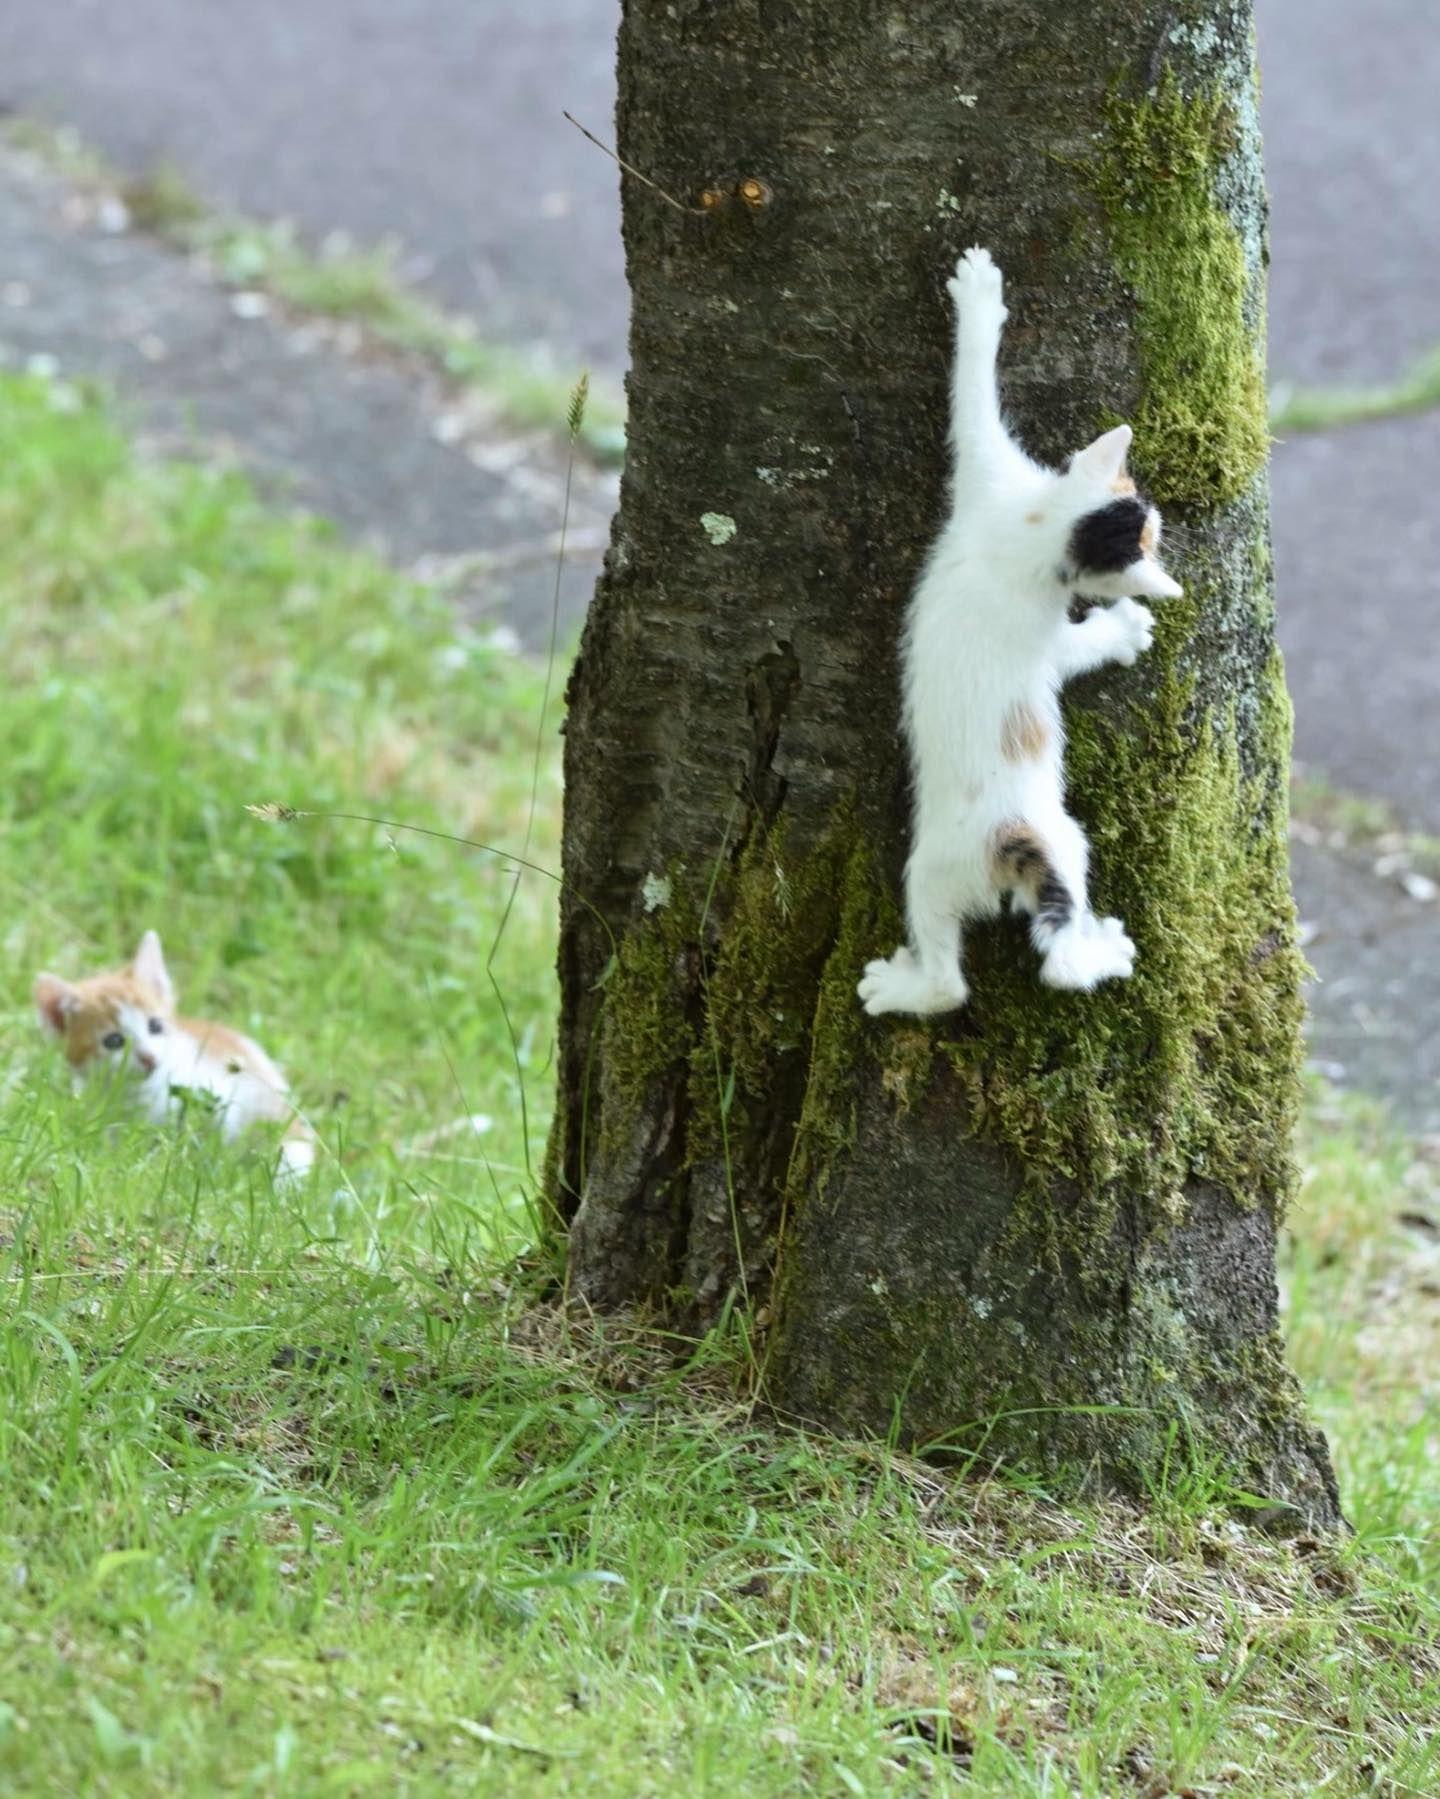 climbing🐈 . #catlover #catstagram #catstocker #kitty #animal #instagramjapan #cat #ねこのきもち #猫 #ポートレート #野良猫 #のら猫 #外猫 #ねこ部 #ねこ #猫部 #nikon #猫好きな人と繋がりたい #🐈 #nekoclub #lovers_nippon #ig_myshot #icu_japan #cats_of_instagram #ふわもこ部 #東京カメラ部 #ファインダー越しの私の世界 #写真好きな人と繋がりたい #tokyocameraclub #僕らの場所は言わにゃいで cats_of_instagram catloversclub catstocker